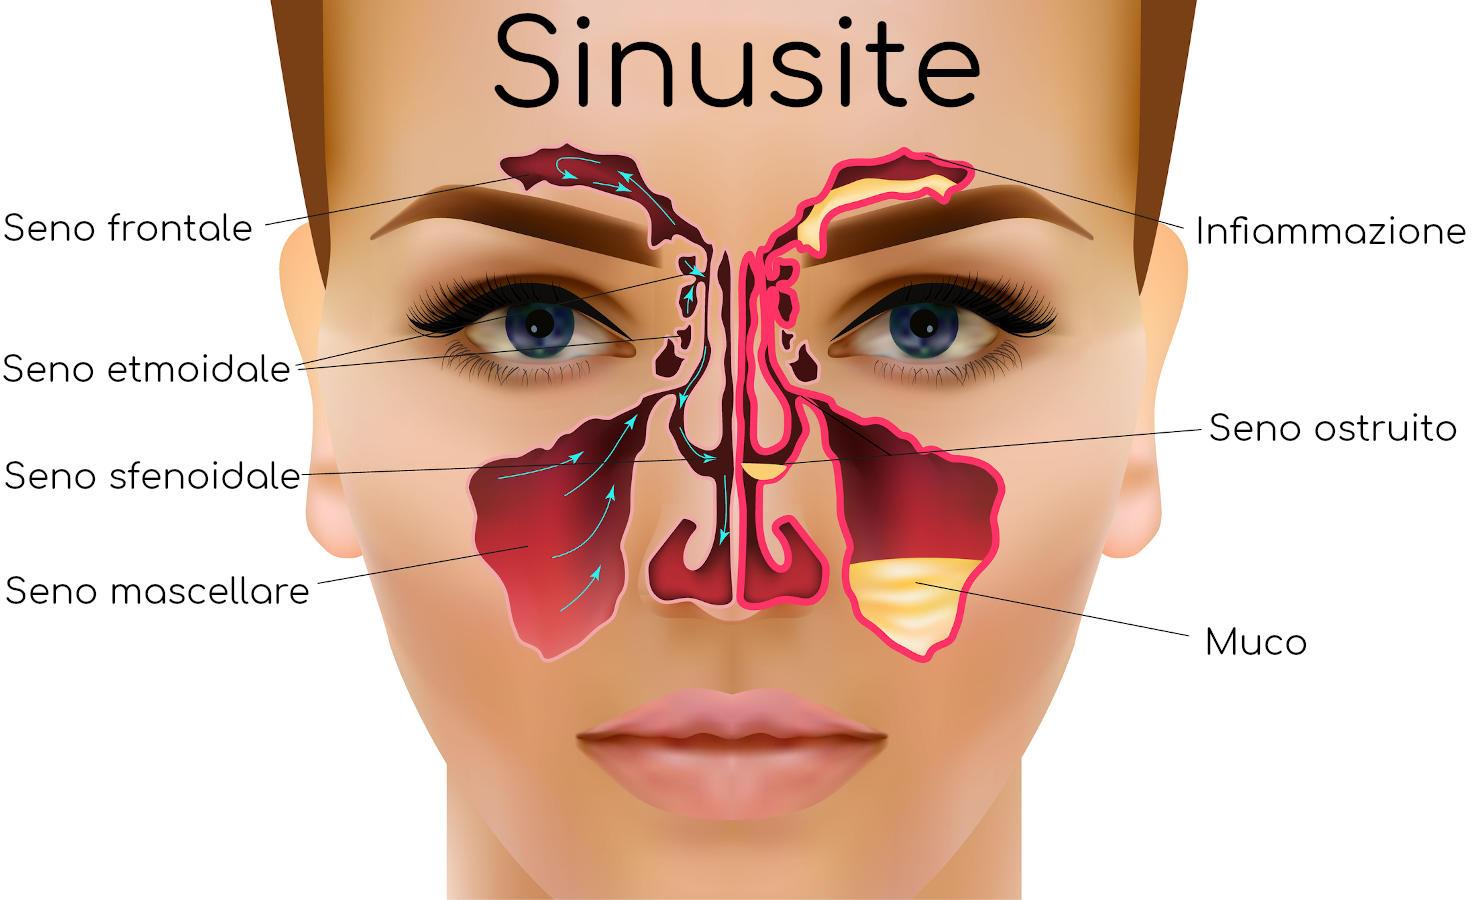 Seni infiammati e sinusite